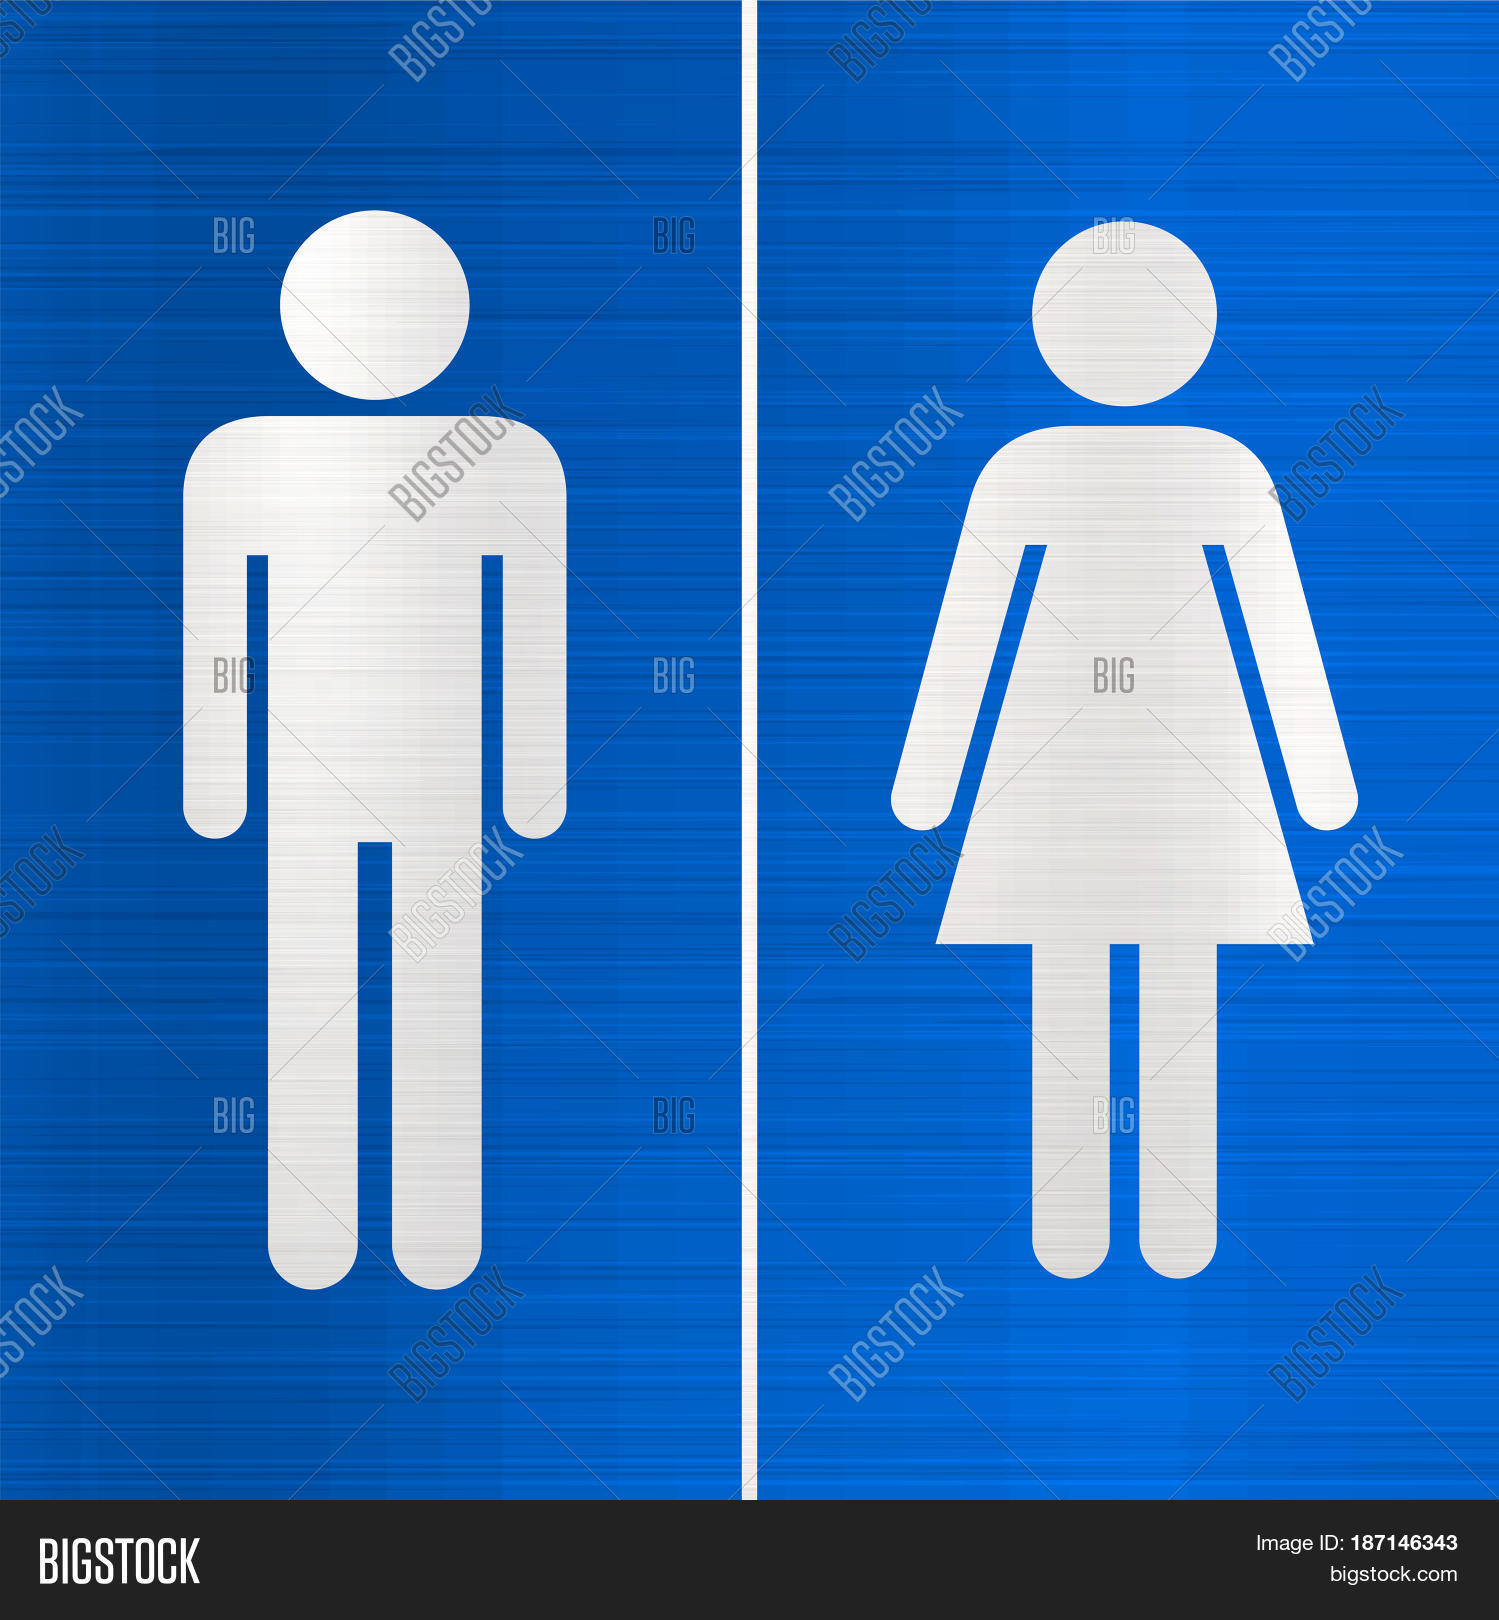 Womens Public Bathroom Toilet Video: Toilet Sign Blue Wc Restroom Women Image & Photo